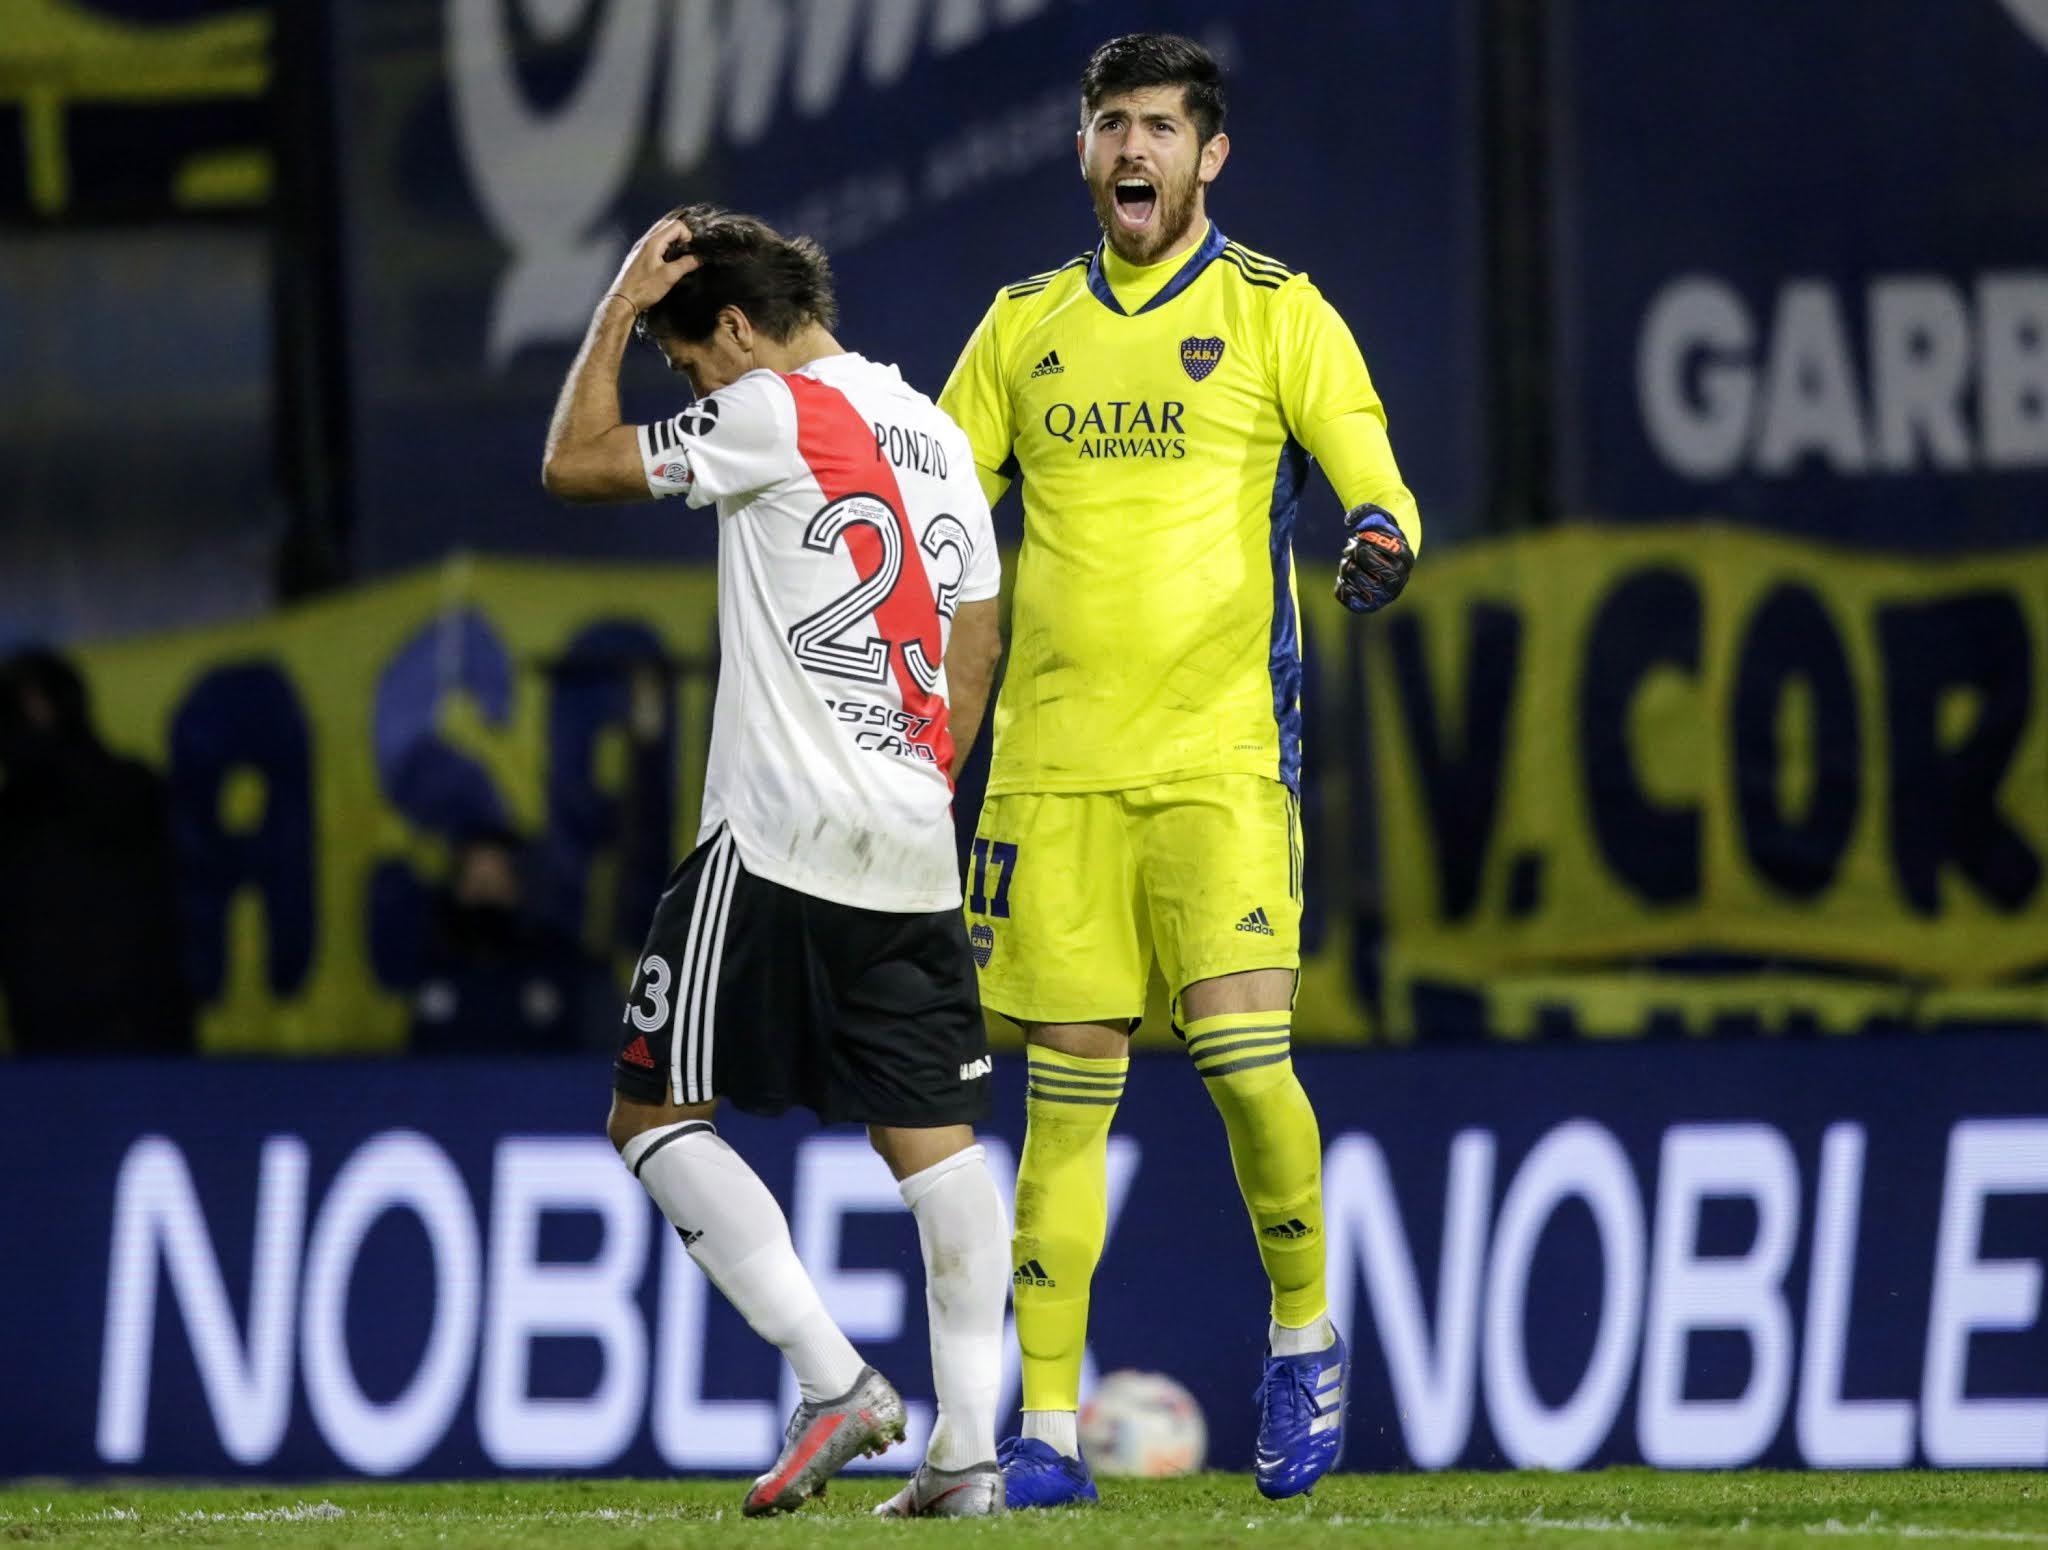 Rossi le atajó el penal a Ponzio